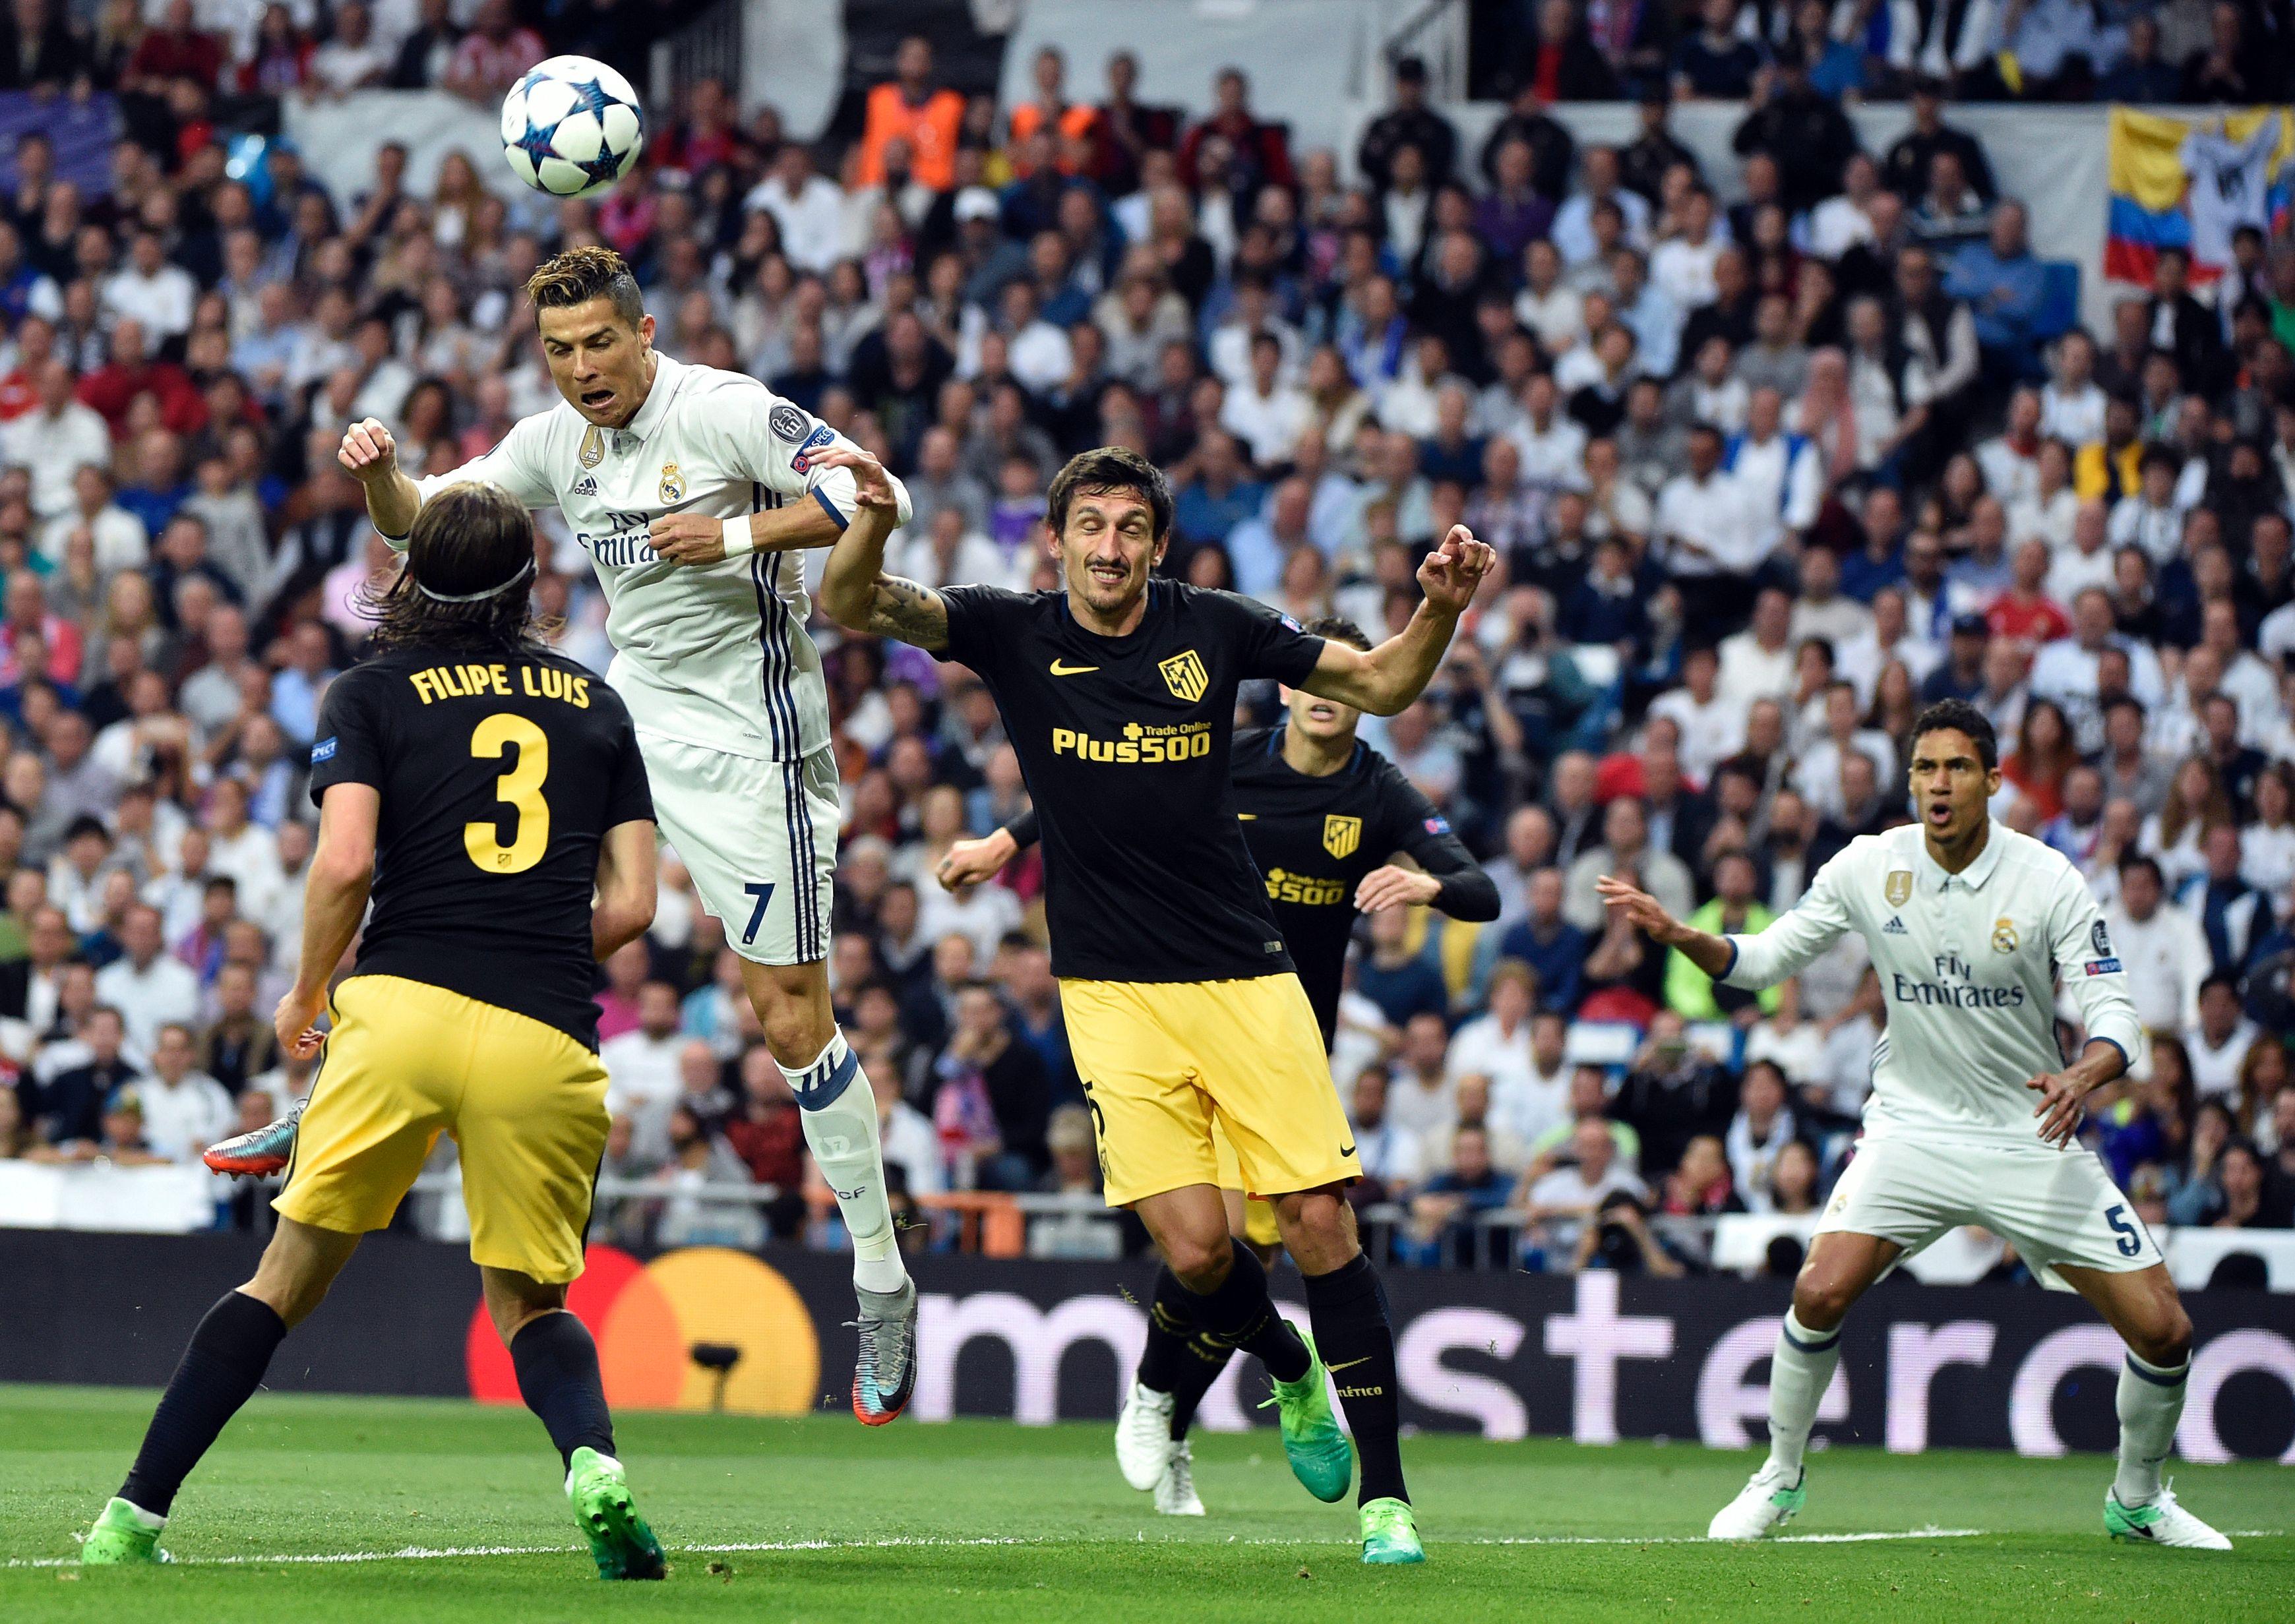 real madrid live score, Real Madrid vs. Atletico Madrid highlights, Real Madrid vs. Atletico Madrid score, real madrid score, real madrid goal,